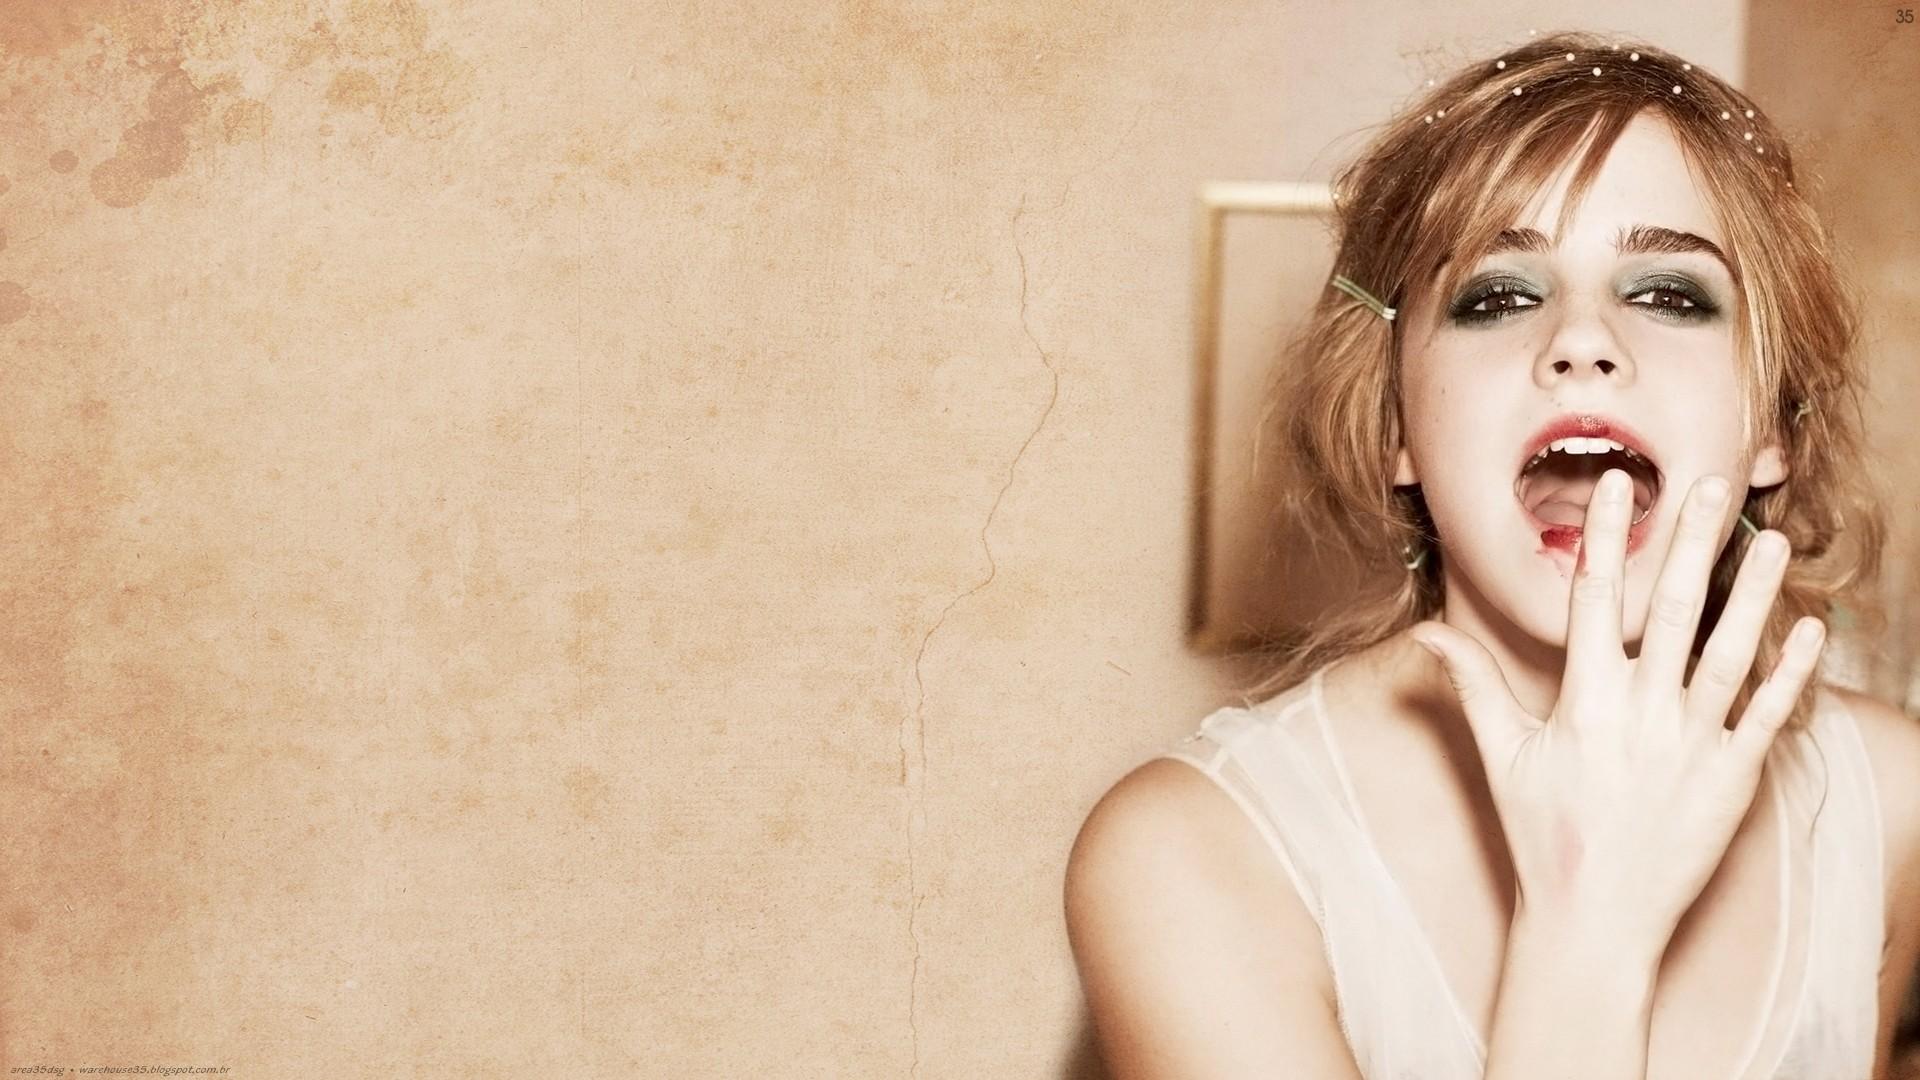 Cute Emma Watson   Wallpaper High Definition High Quality 1920x1080